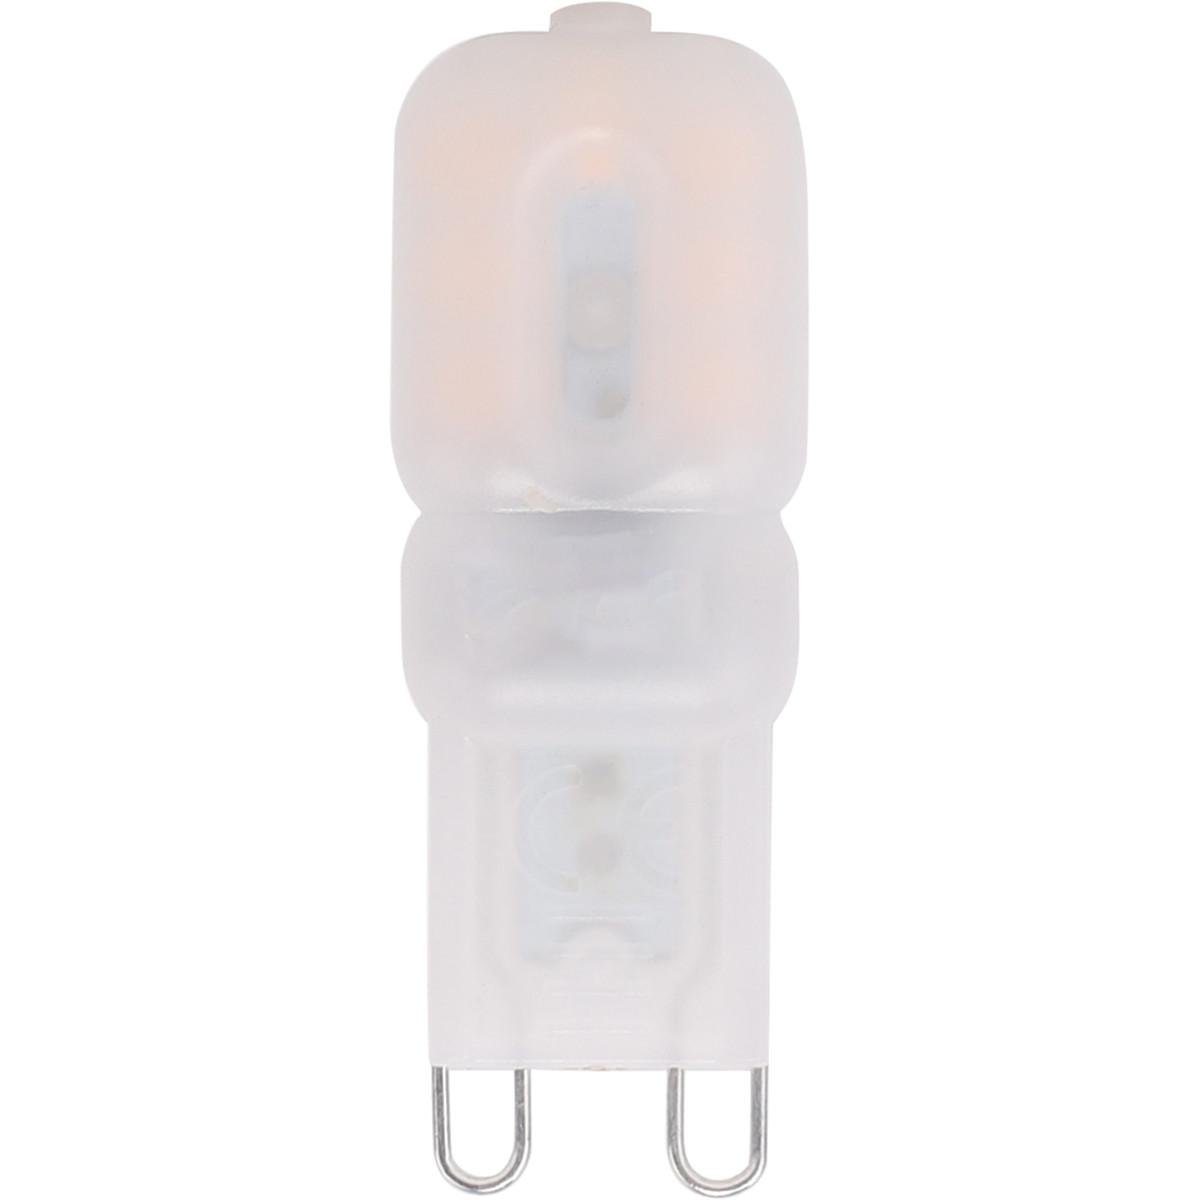 LED Lamp - Aigi - G9 Fitting - 2.5W - Warm Wit 3000K | Vervangt 25W